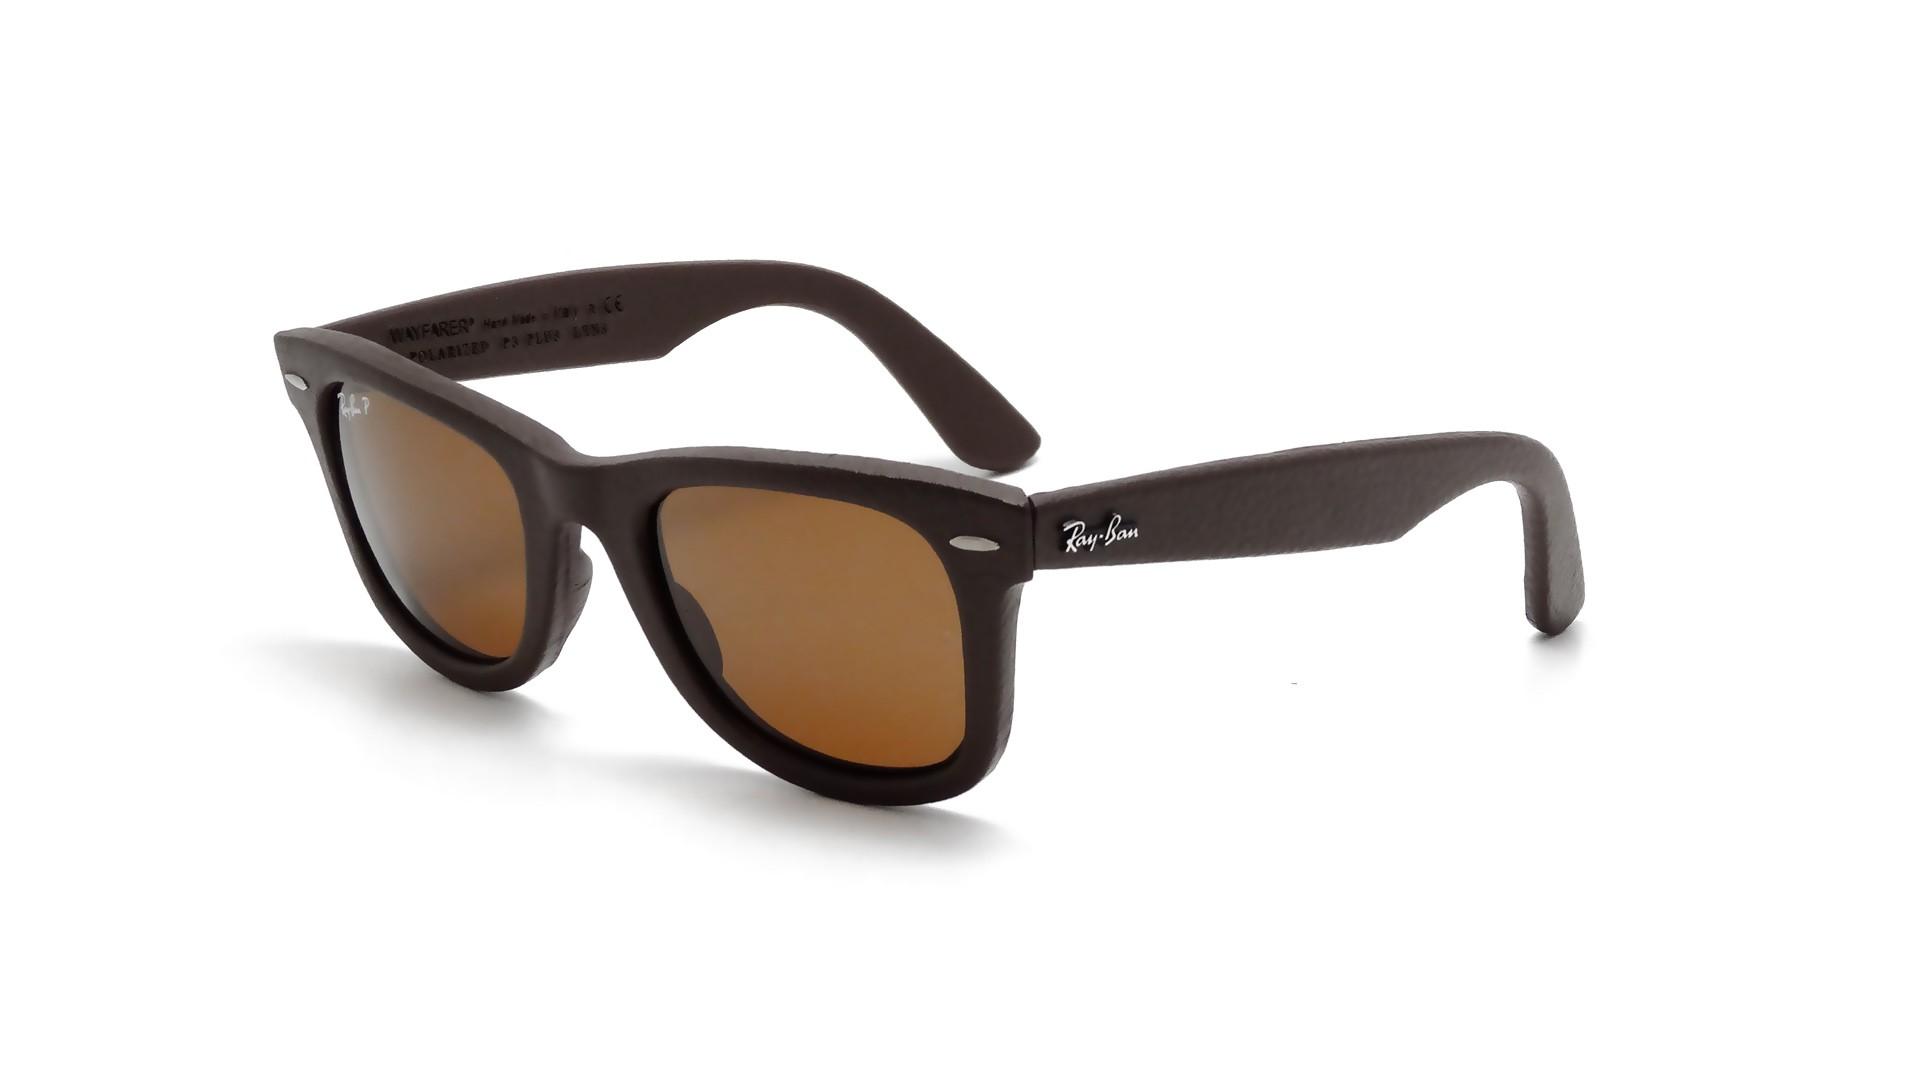 Ray Ban Wayfarer Leather Sunglasses  ban original wayfarer genuine leather brown rb2140qm 1153 n6 50 22